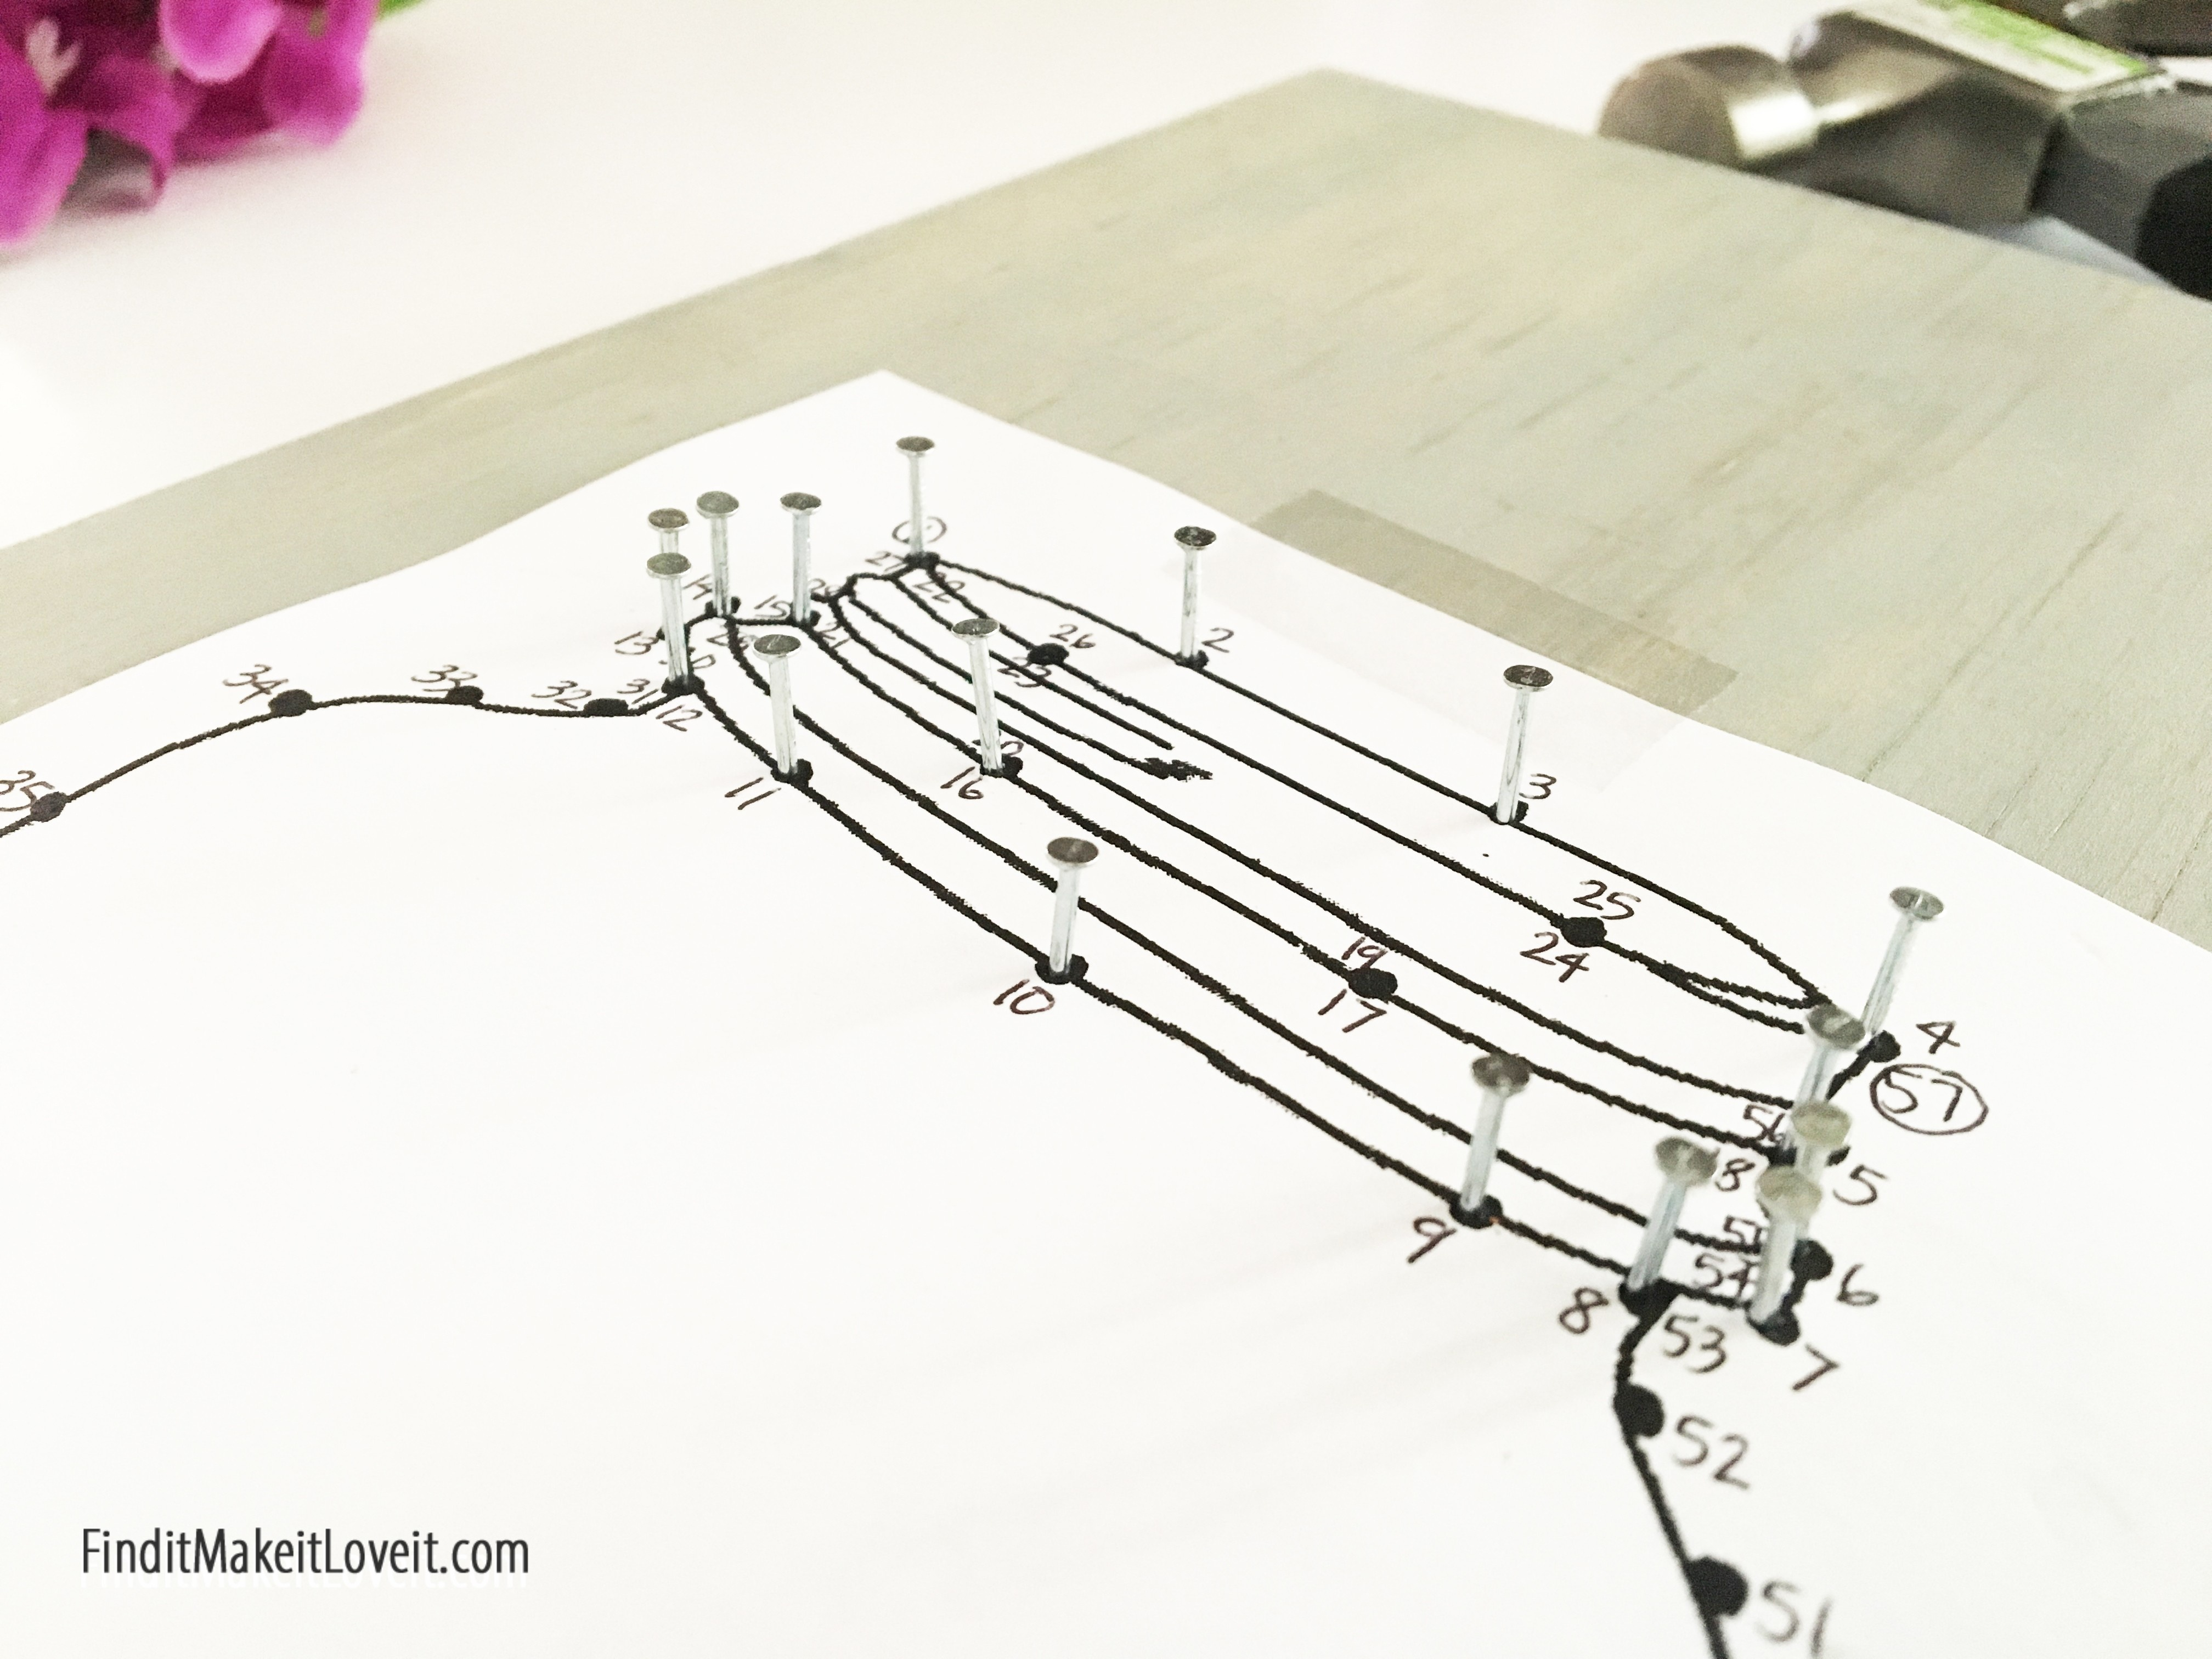 Free Printable String Art Patterns Best Of Art Template Thevillas - Free Printable String Art Patterns